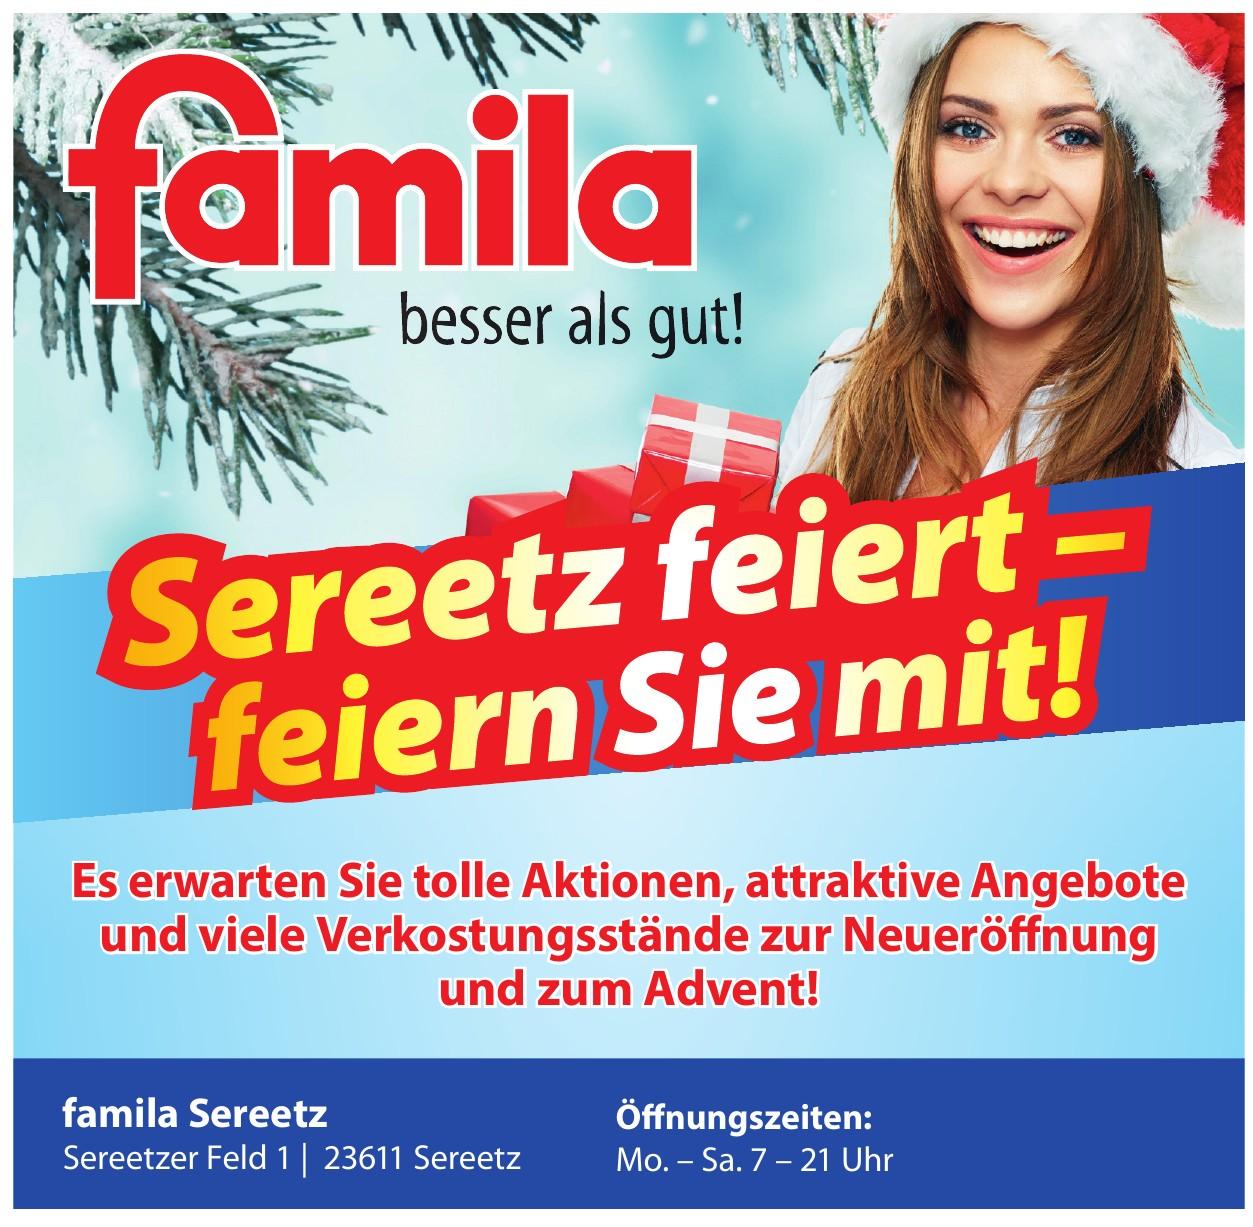 familia Sereetz